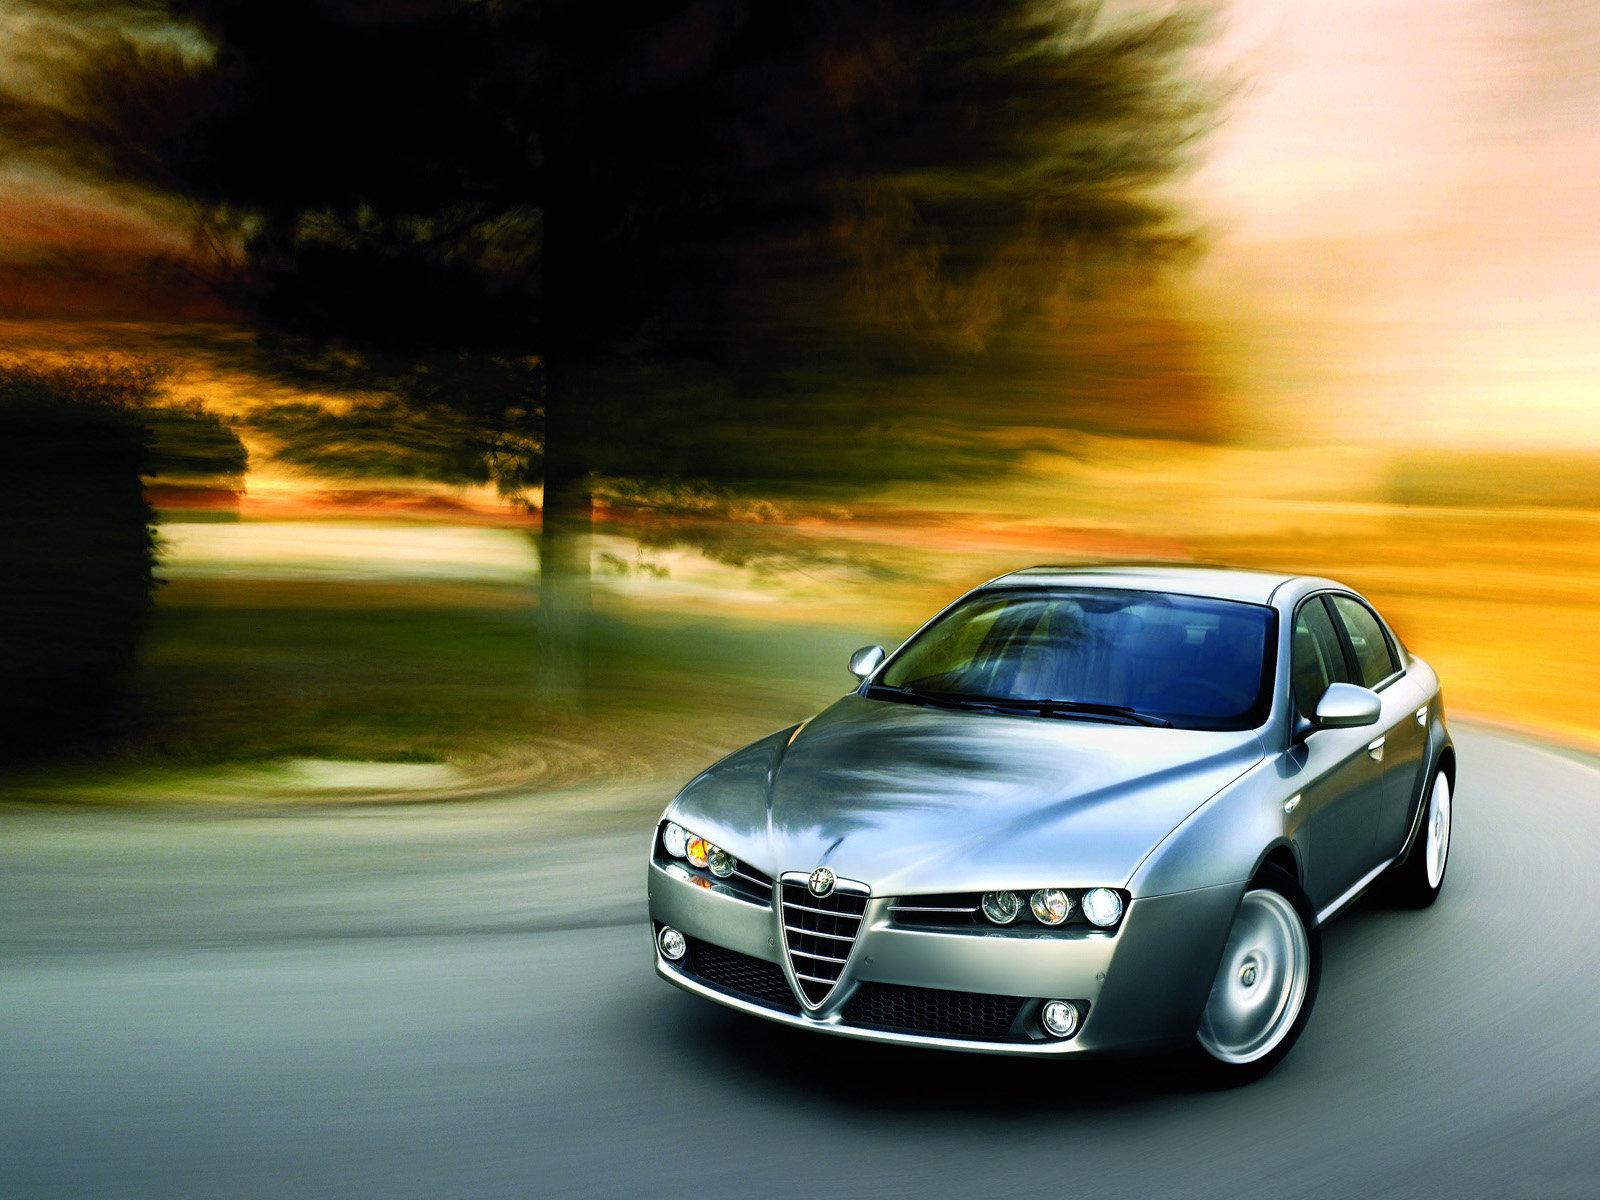 Best Alfa Romeo 159 Wallpaper Id 282606 For High Resolution Hd 1600x1200 Desktop